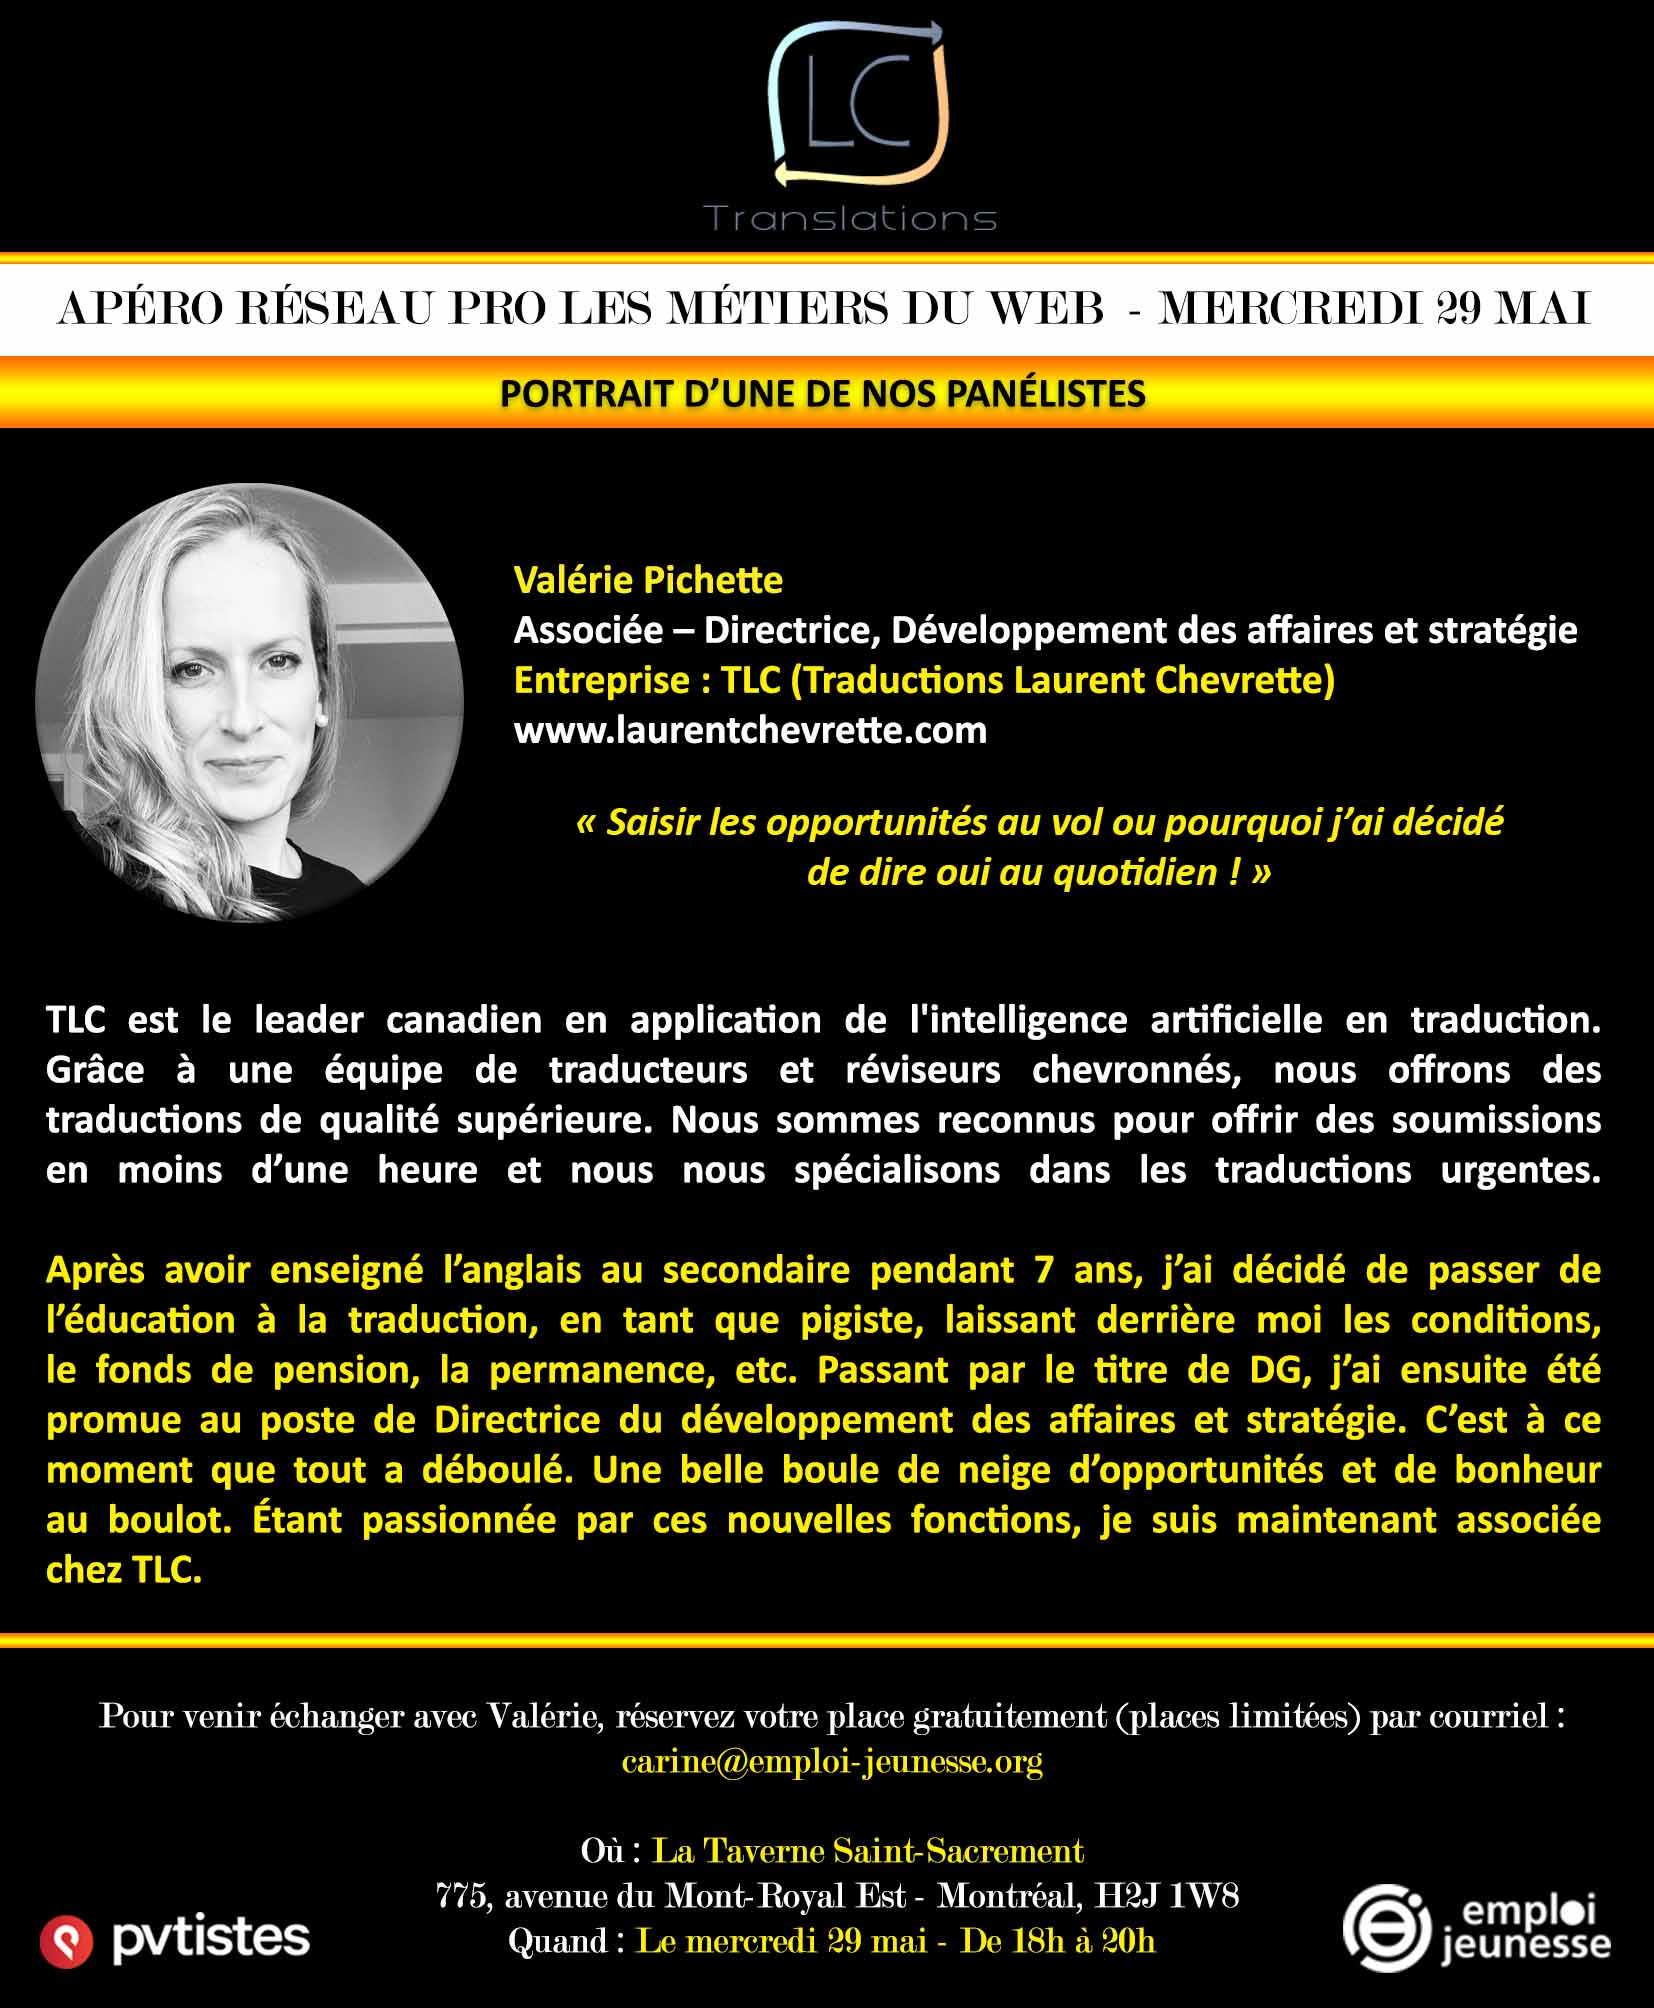 Valérie Pichette TLC - Web